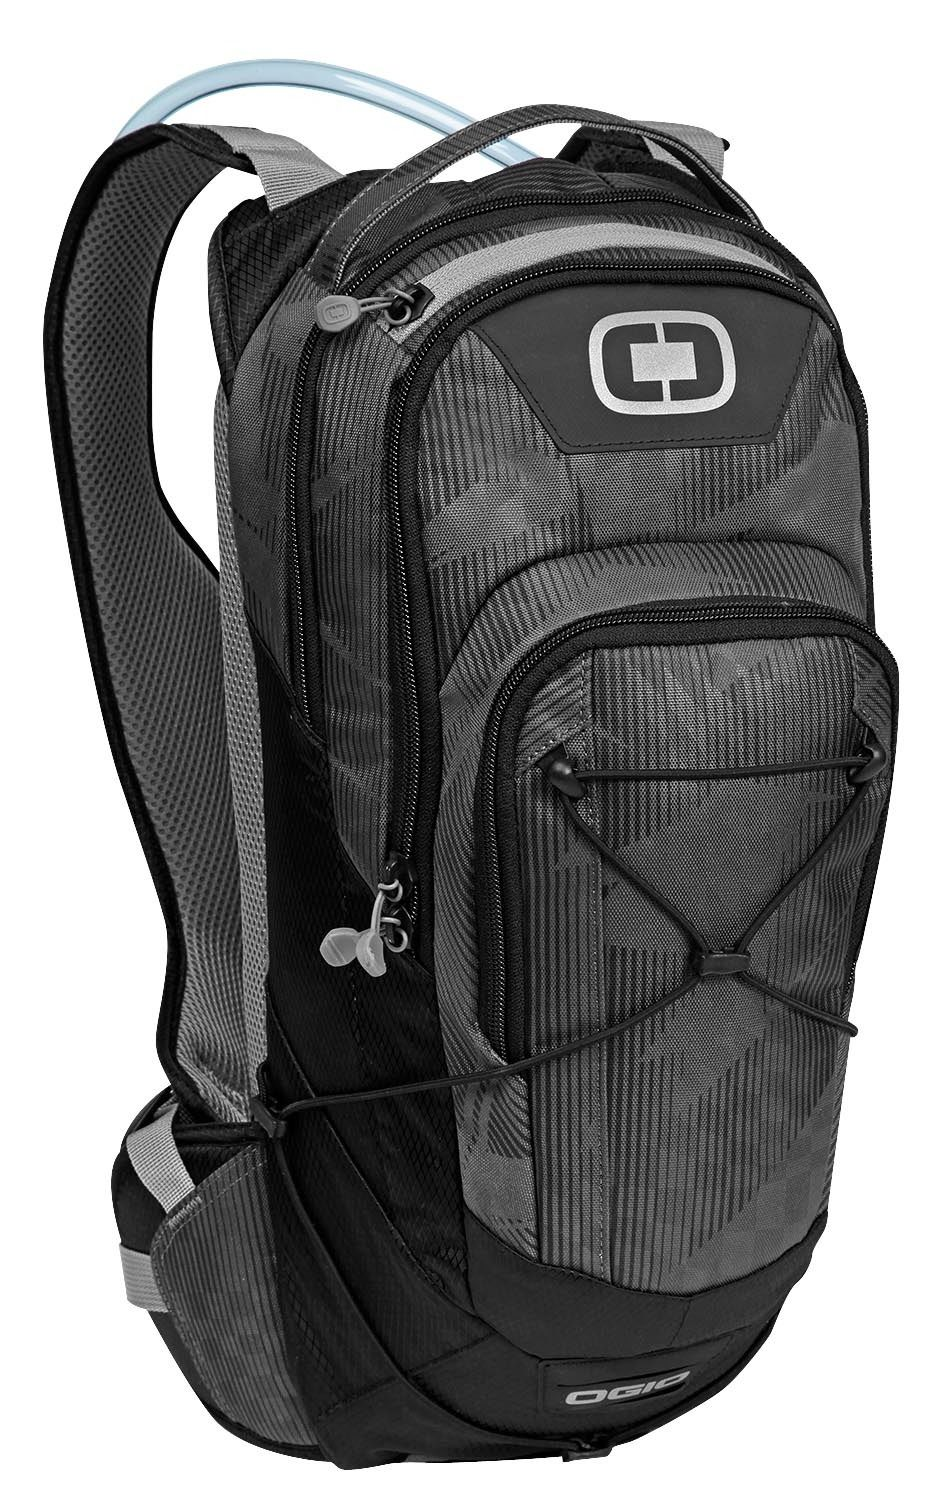 OGIO Baja 70 Hydration Backpack | 20% ($18.00) Off! - RevZilla